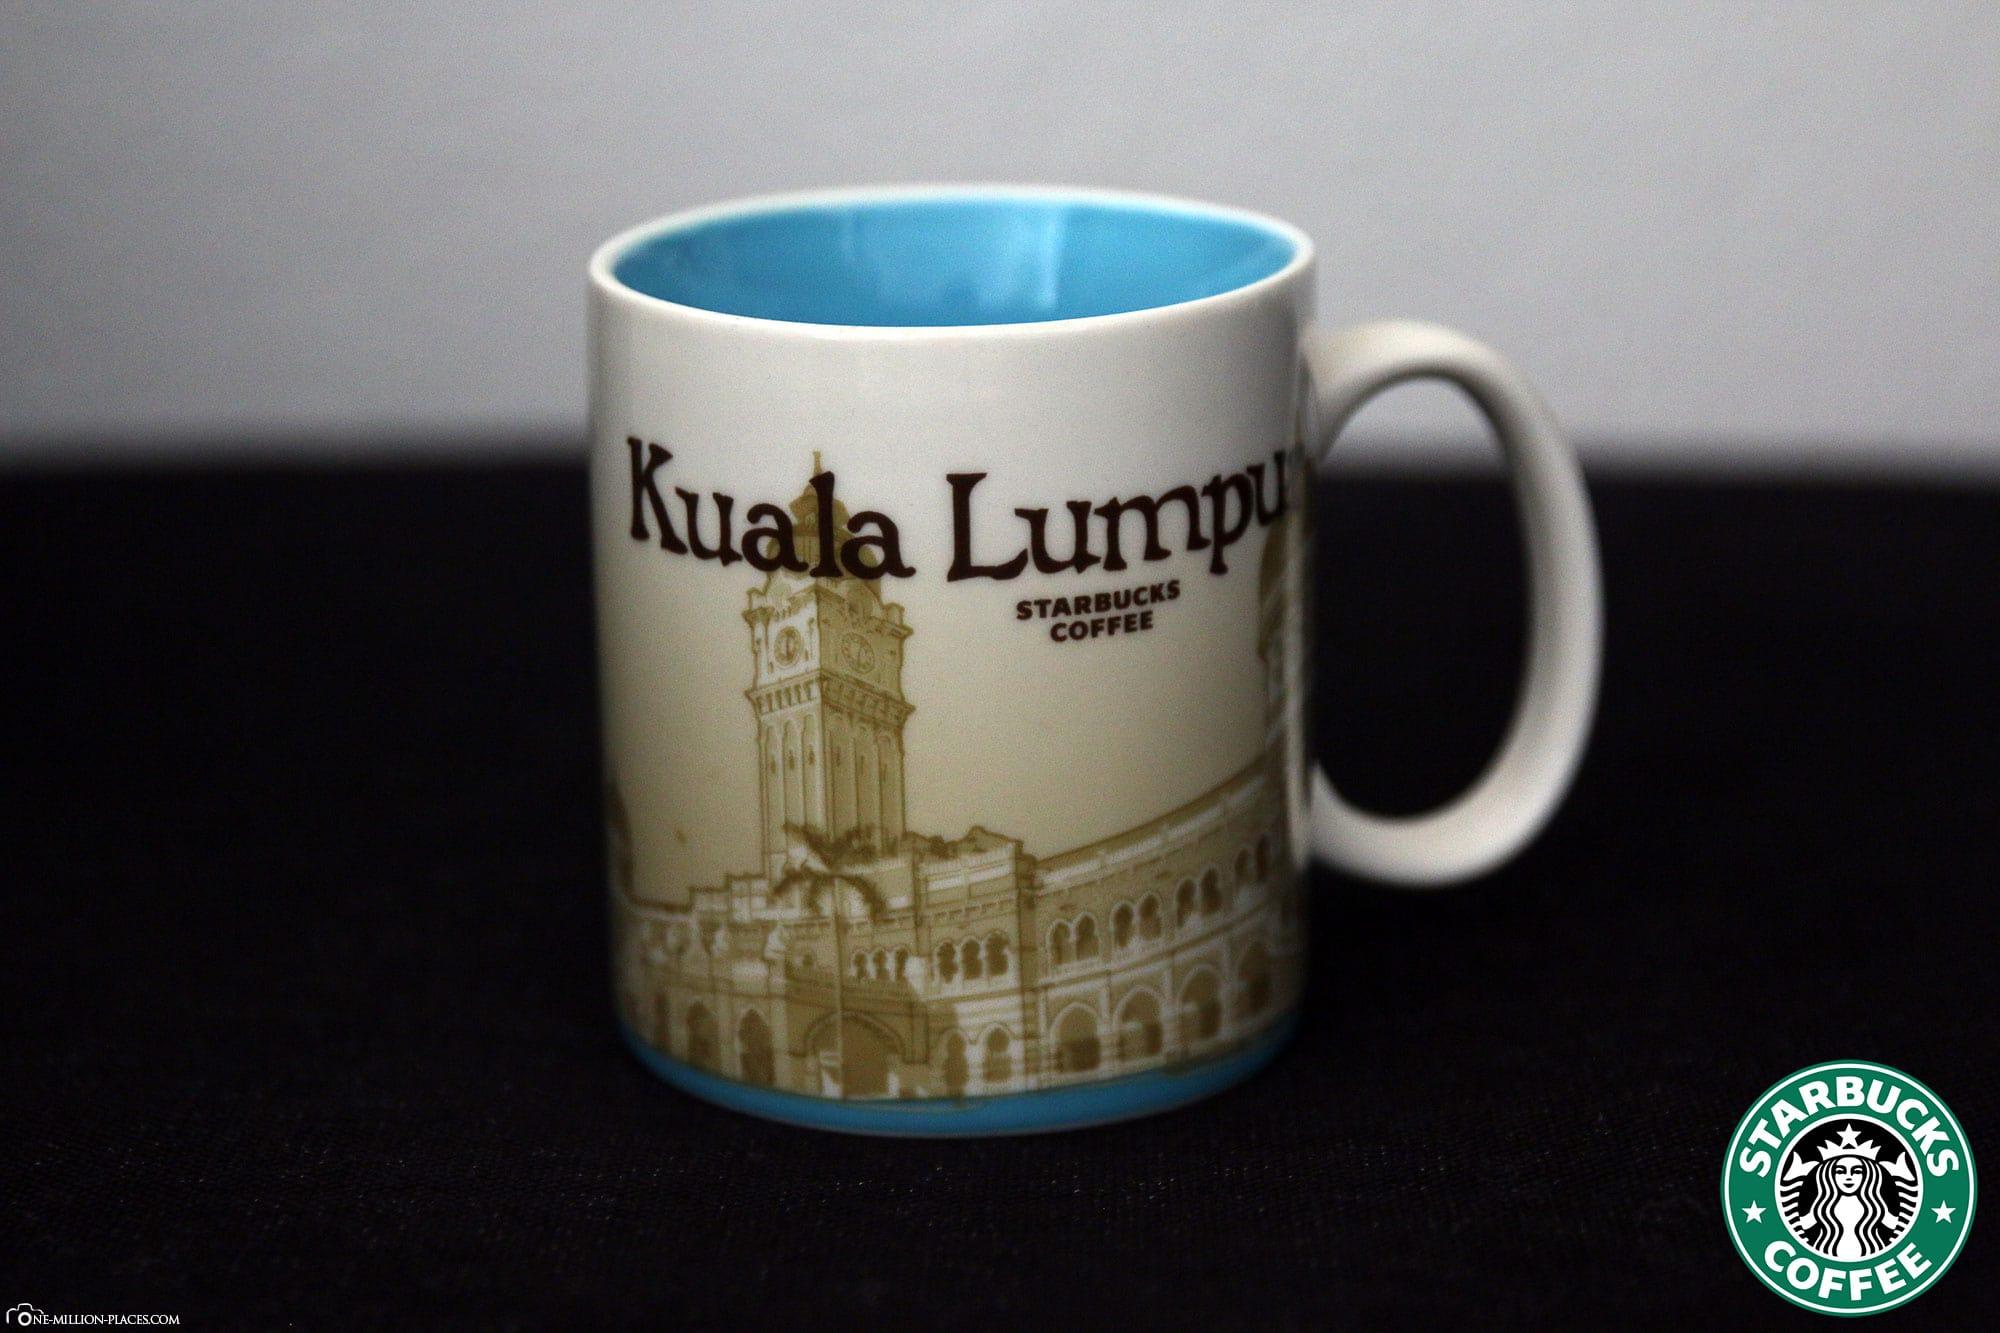 Kuala Lumpur, Starbucks Cup, Global Icon Series, City Mugs, Collection, Malaysia, Travelreport